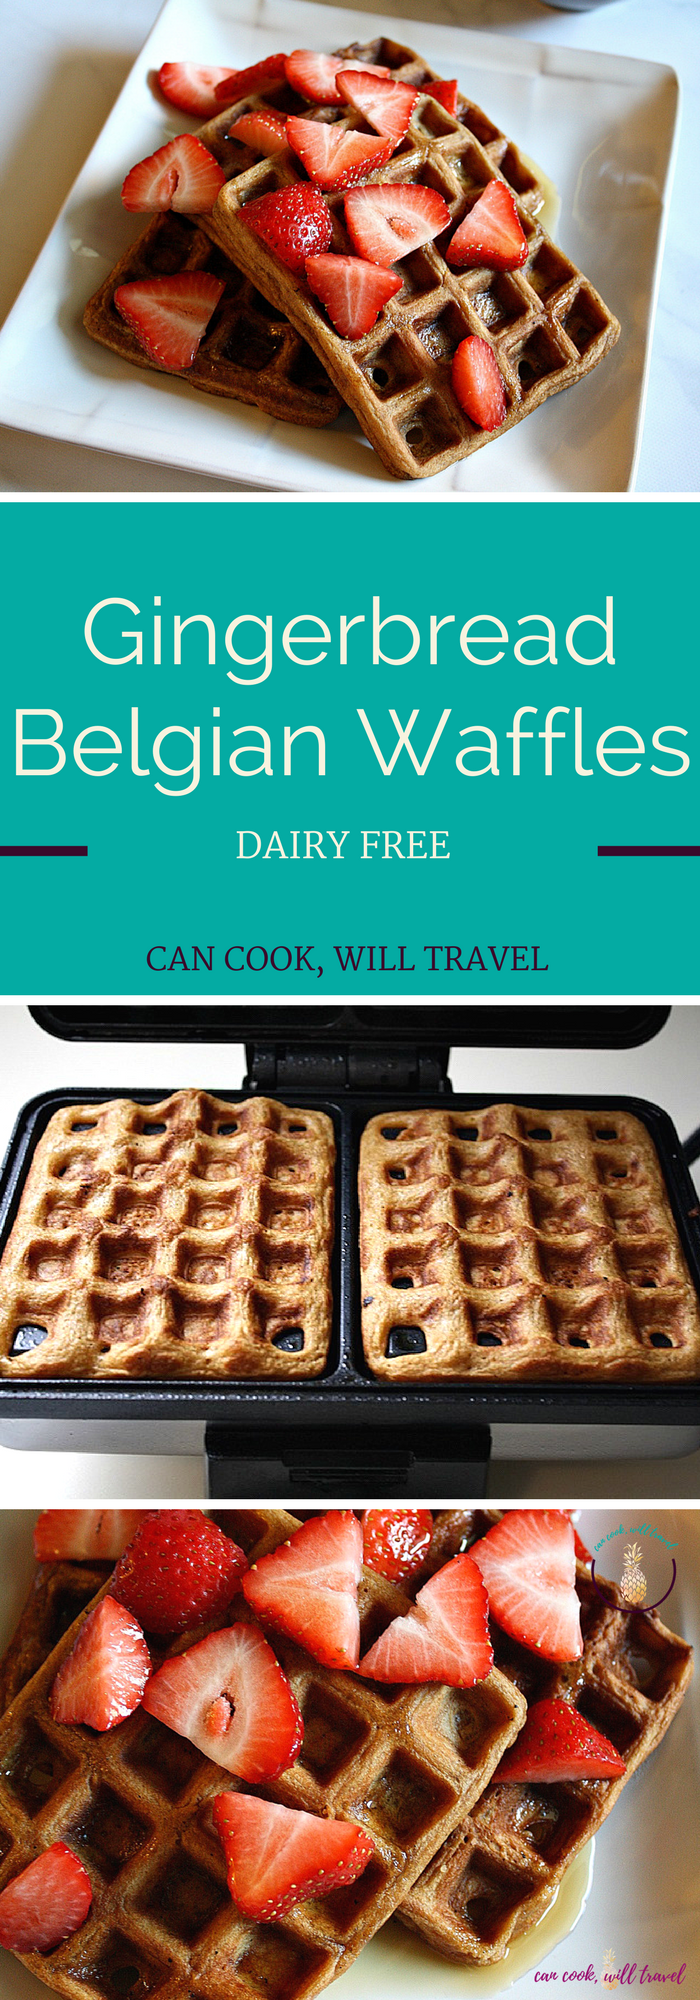 Gingerbread Belgian Waffles_Collage2